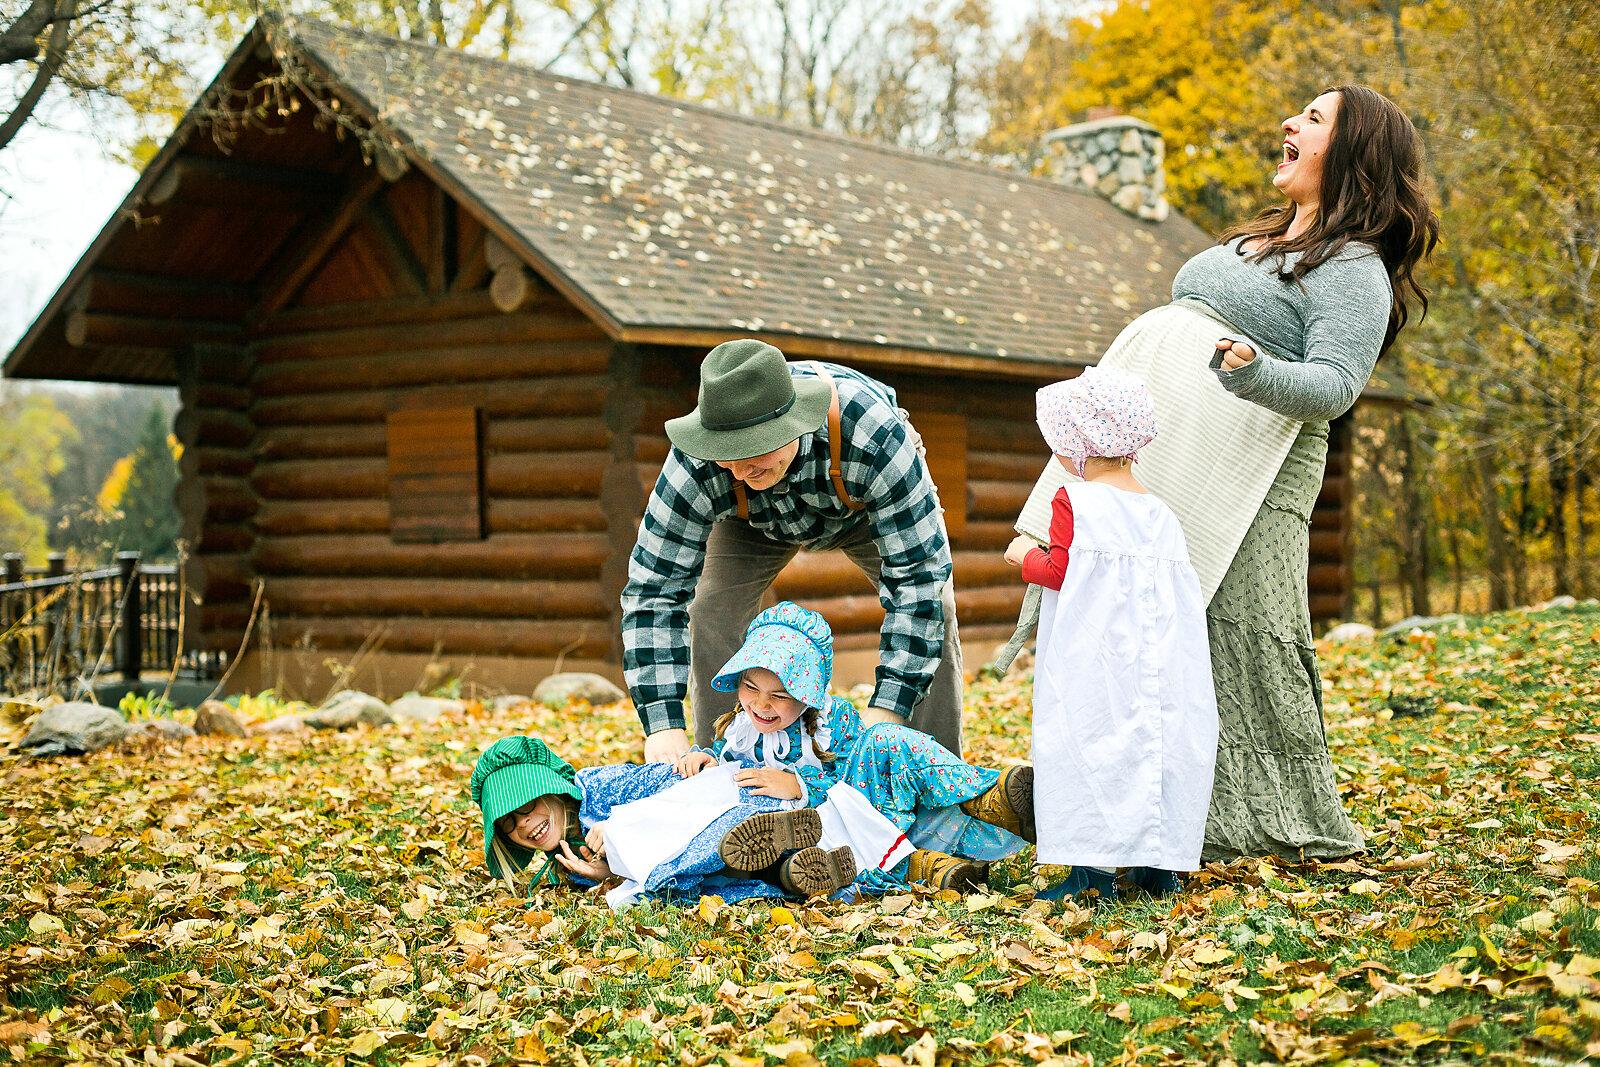 ingalls_family_halloween_002.jpg